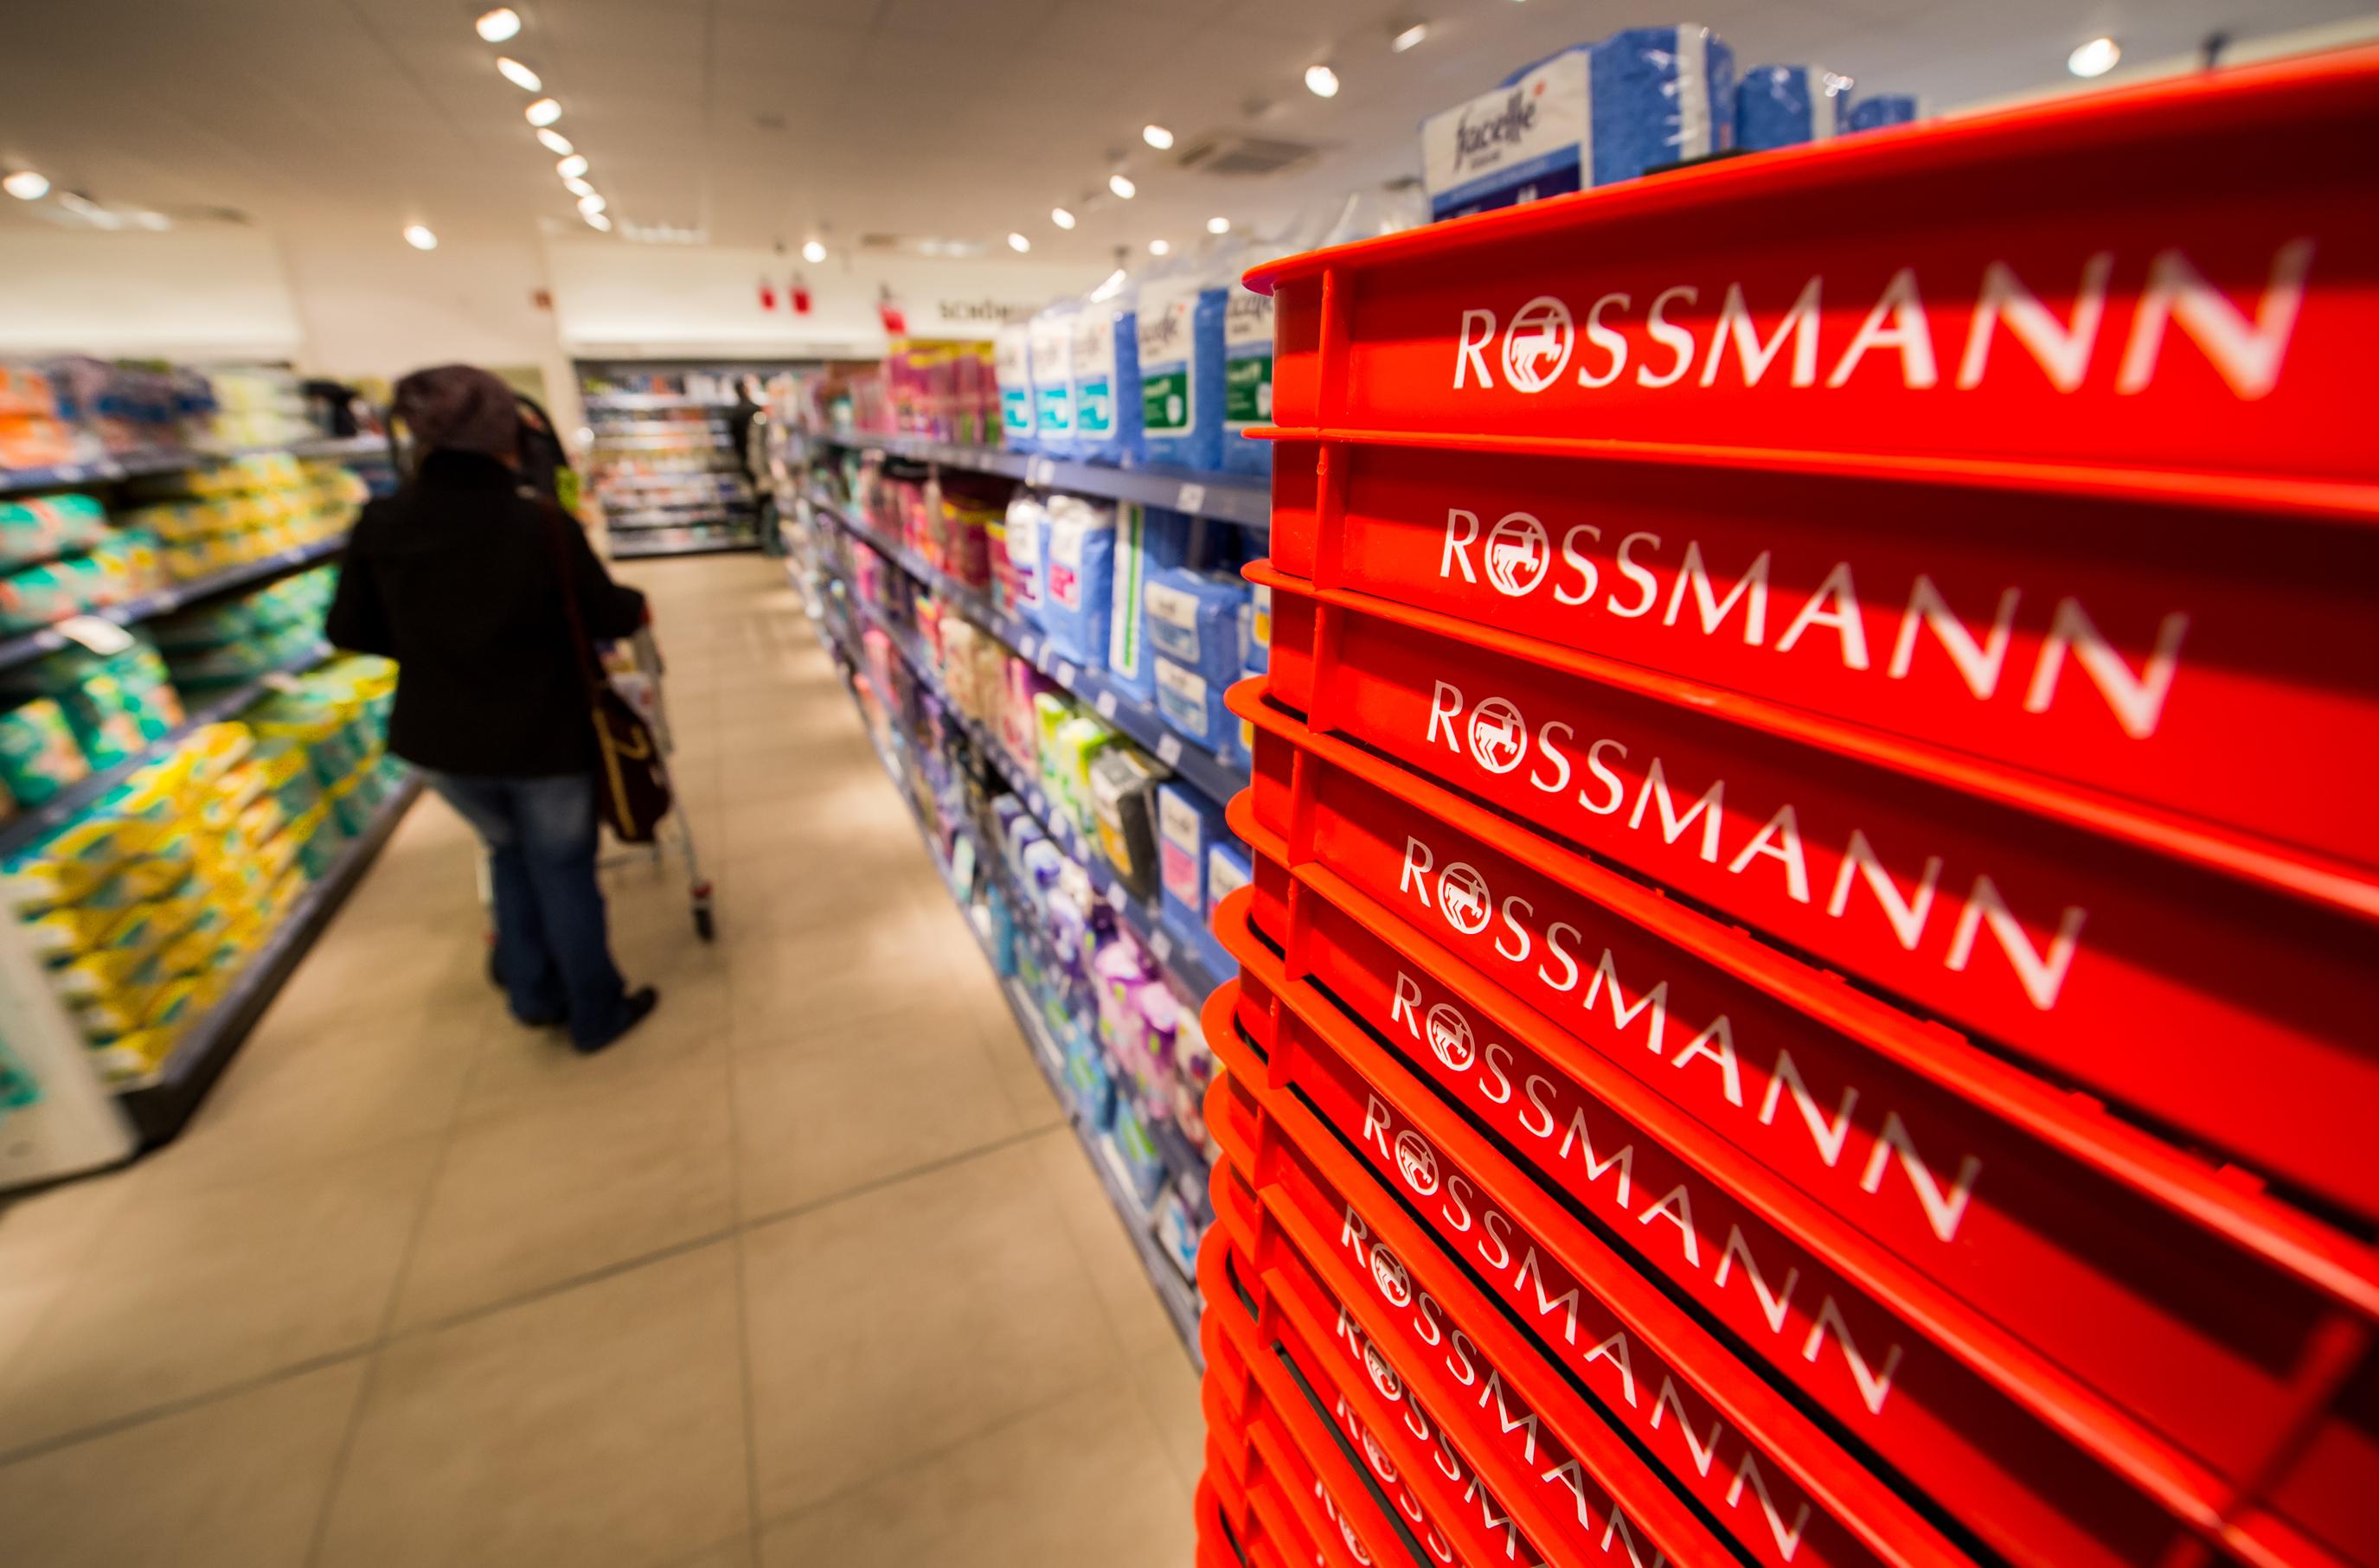 Amazon kooperiert mit Rossmann – Experteneinschätzung